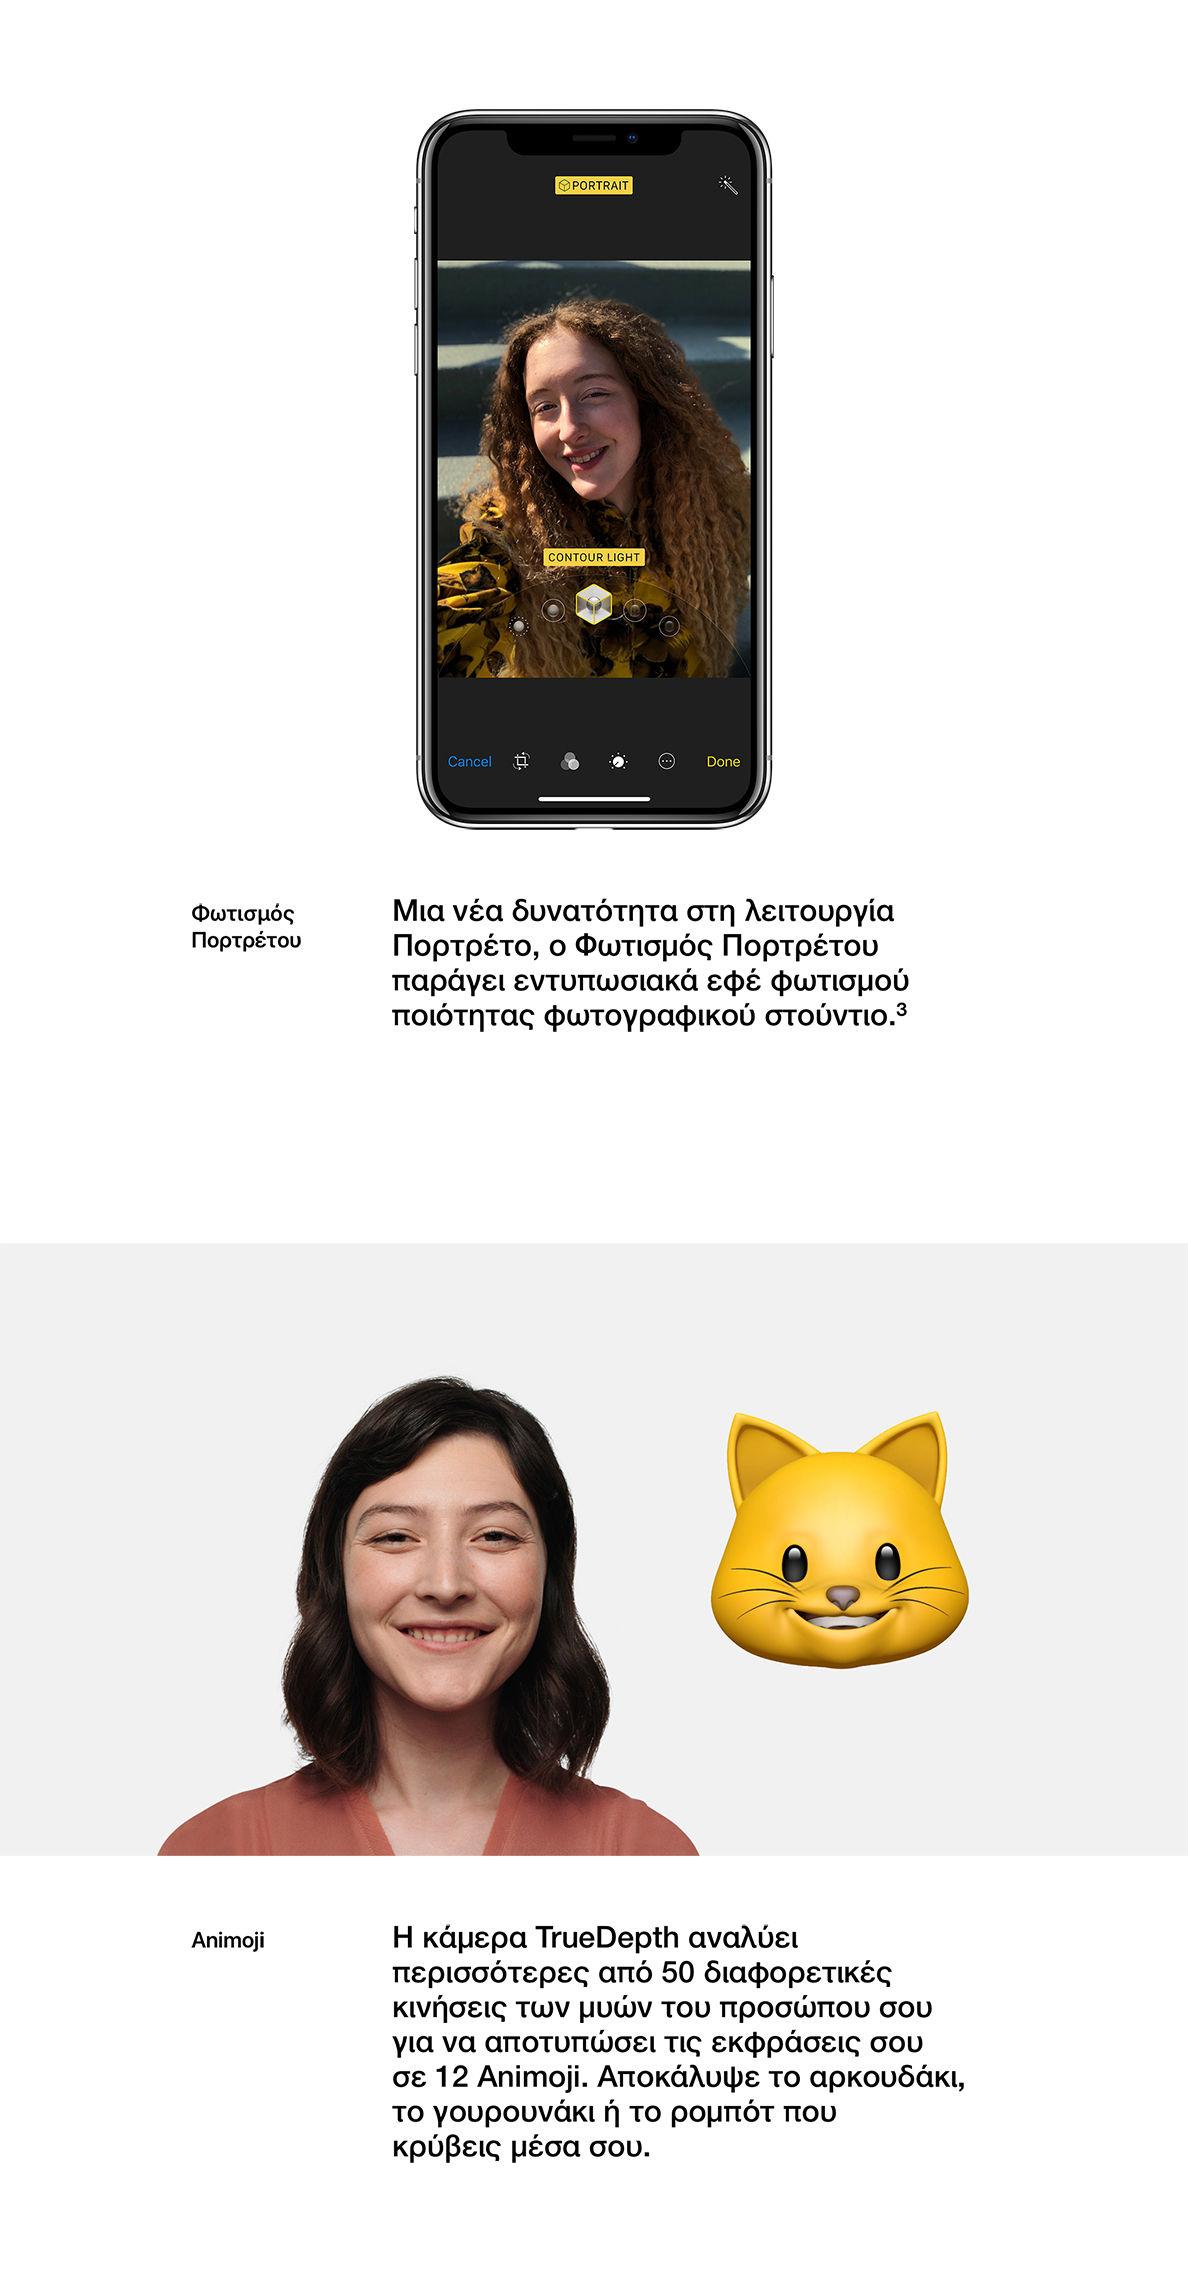 iPhonex-agora-Ellada-Mediamarkt-public-kotsovolos-germanos-iPhoneX-diathesimo-gia-paraggelia-november-2017 (8)